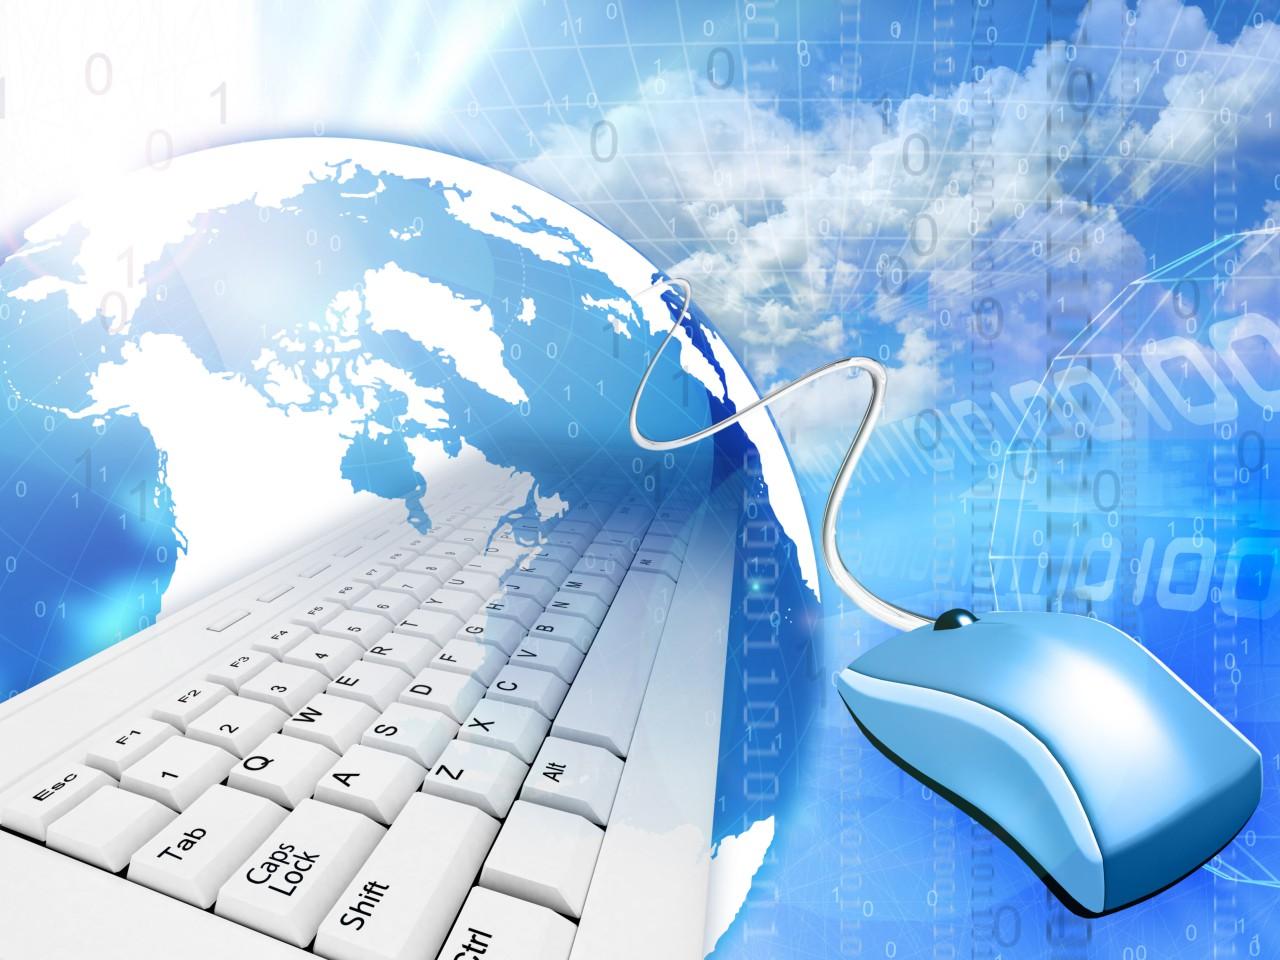 Computer education wallpaper